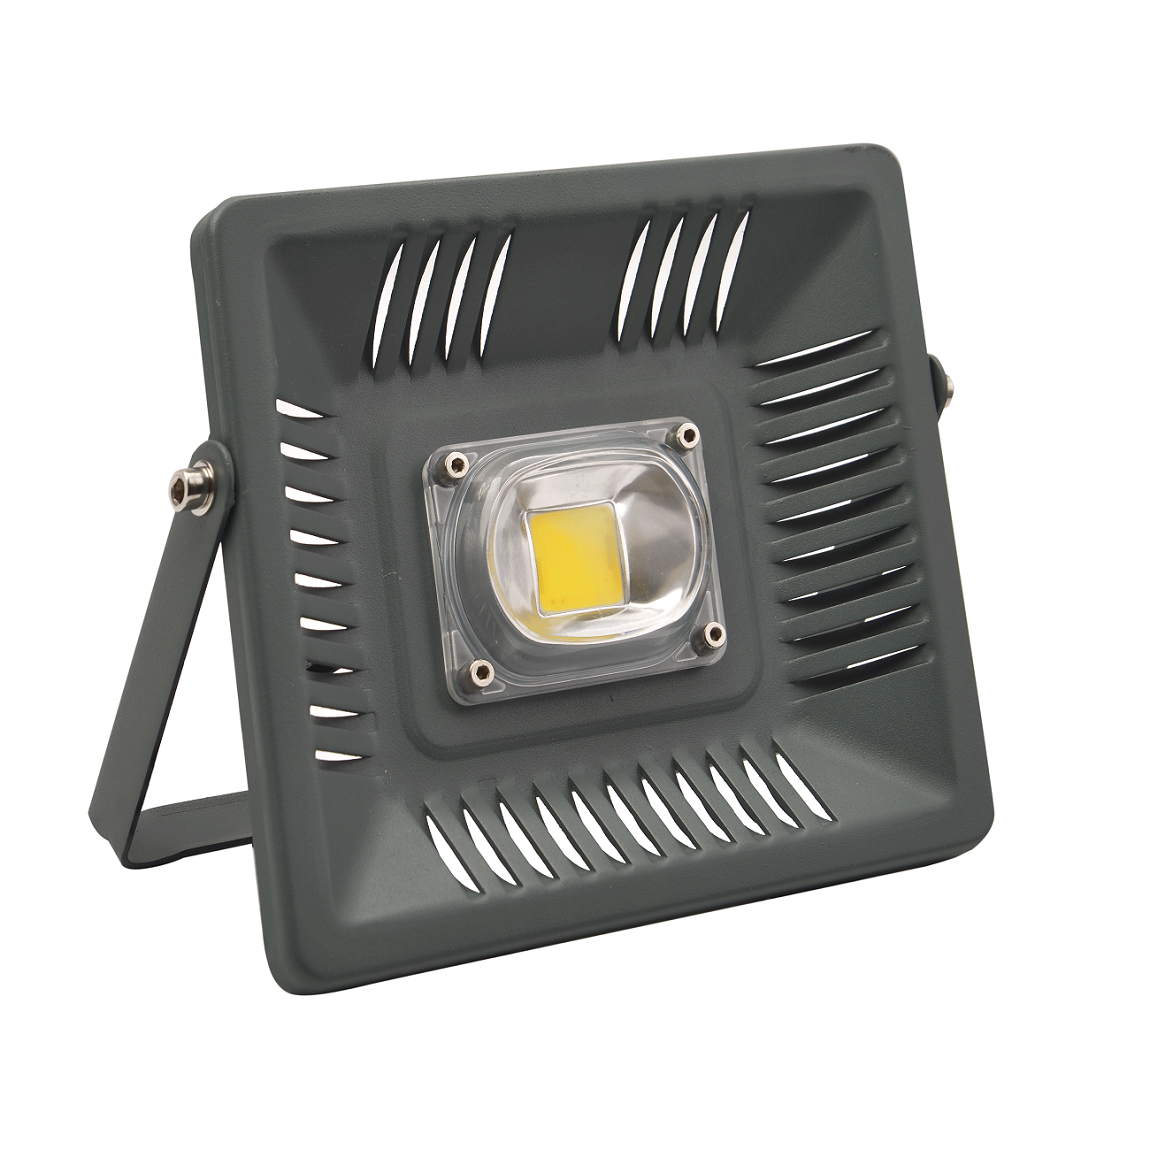 GENESIS FL-6041 - 50 Watt Ultra Slim COB LED Projektör